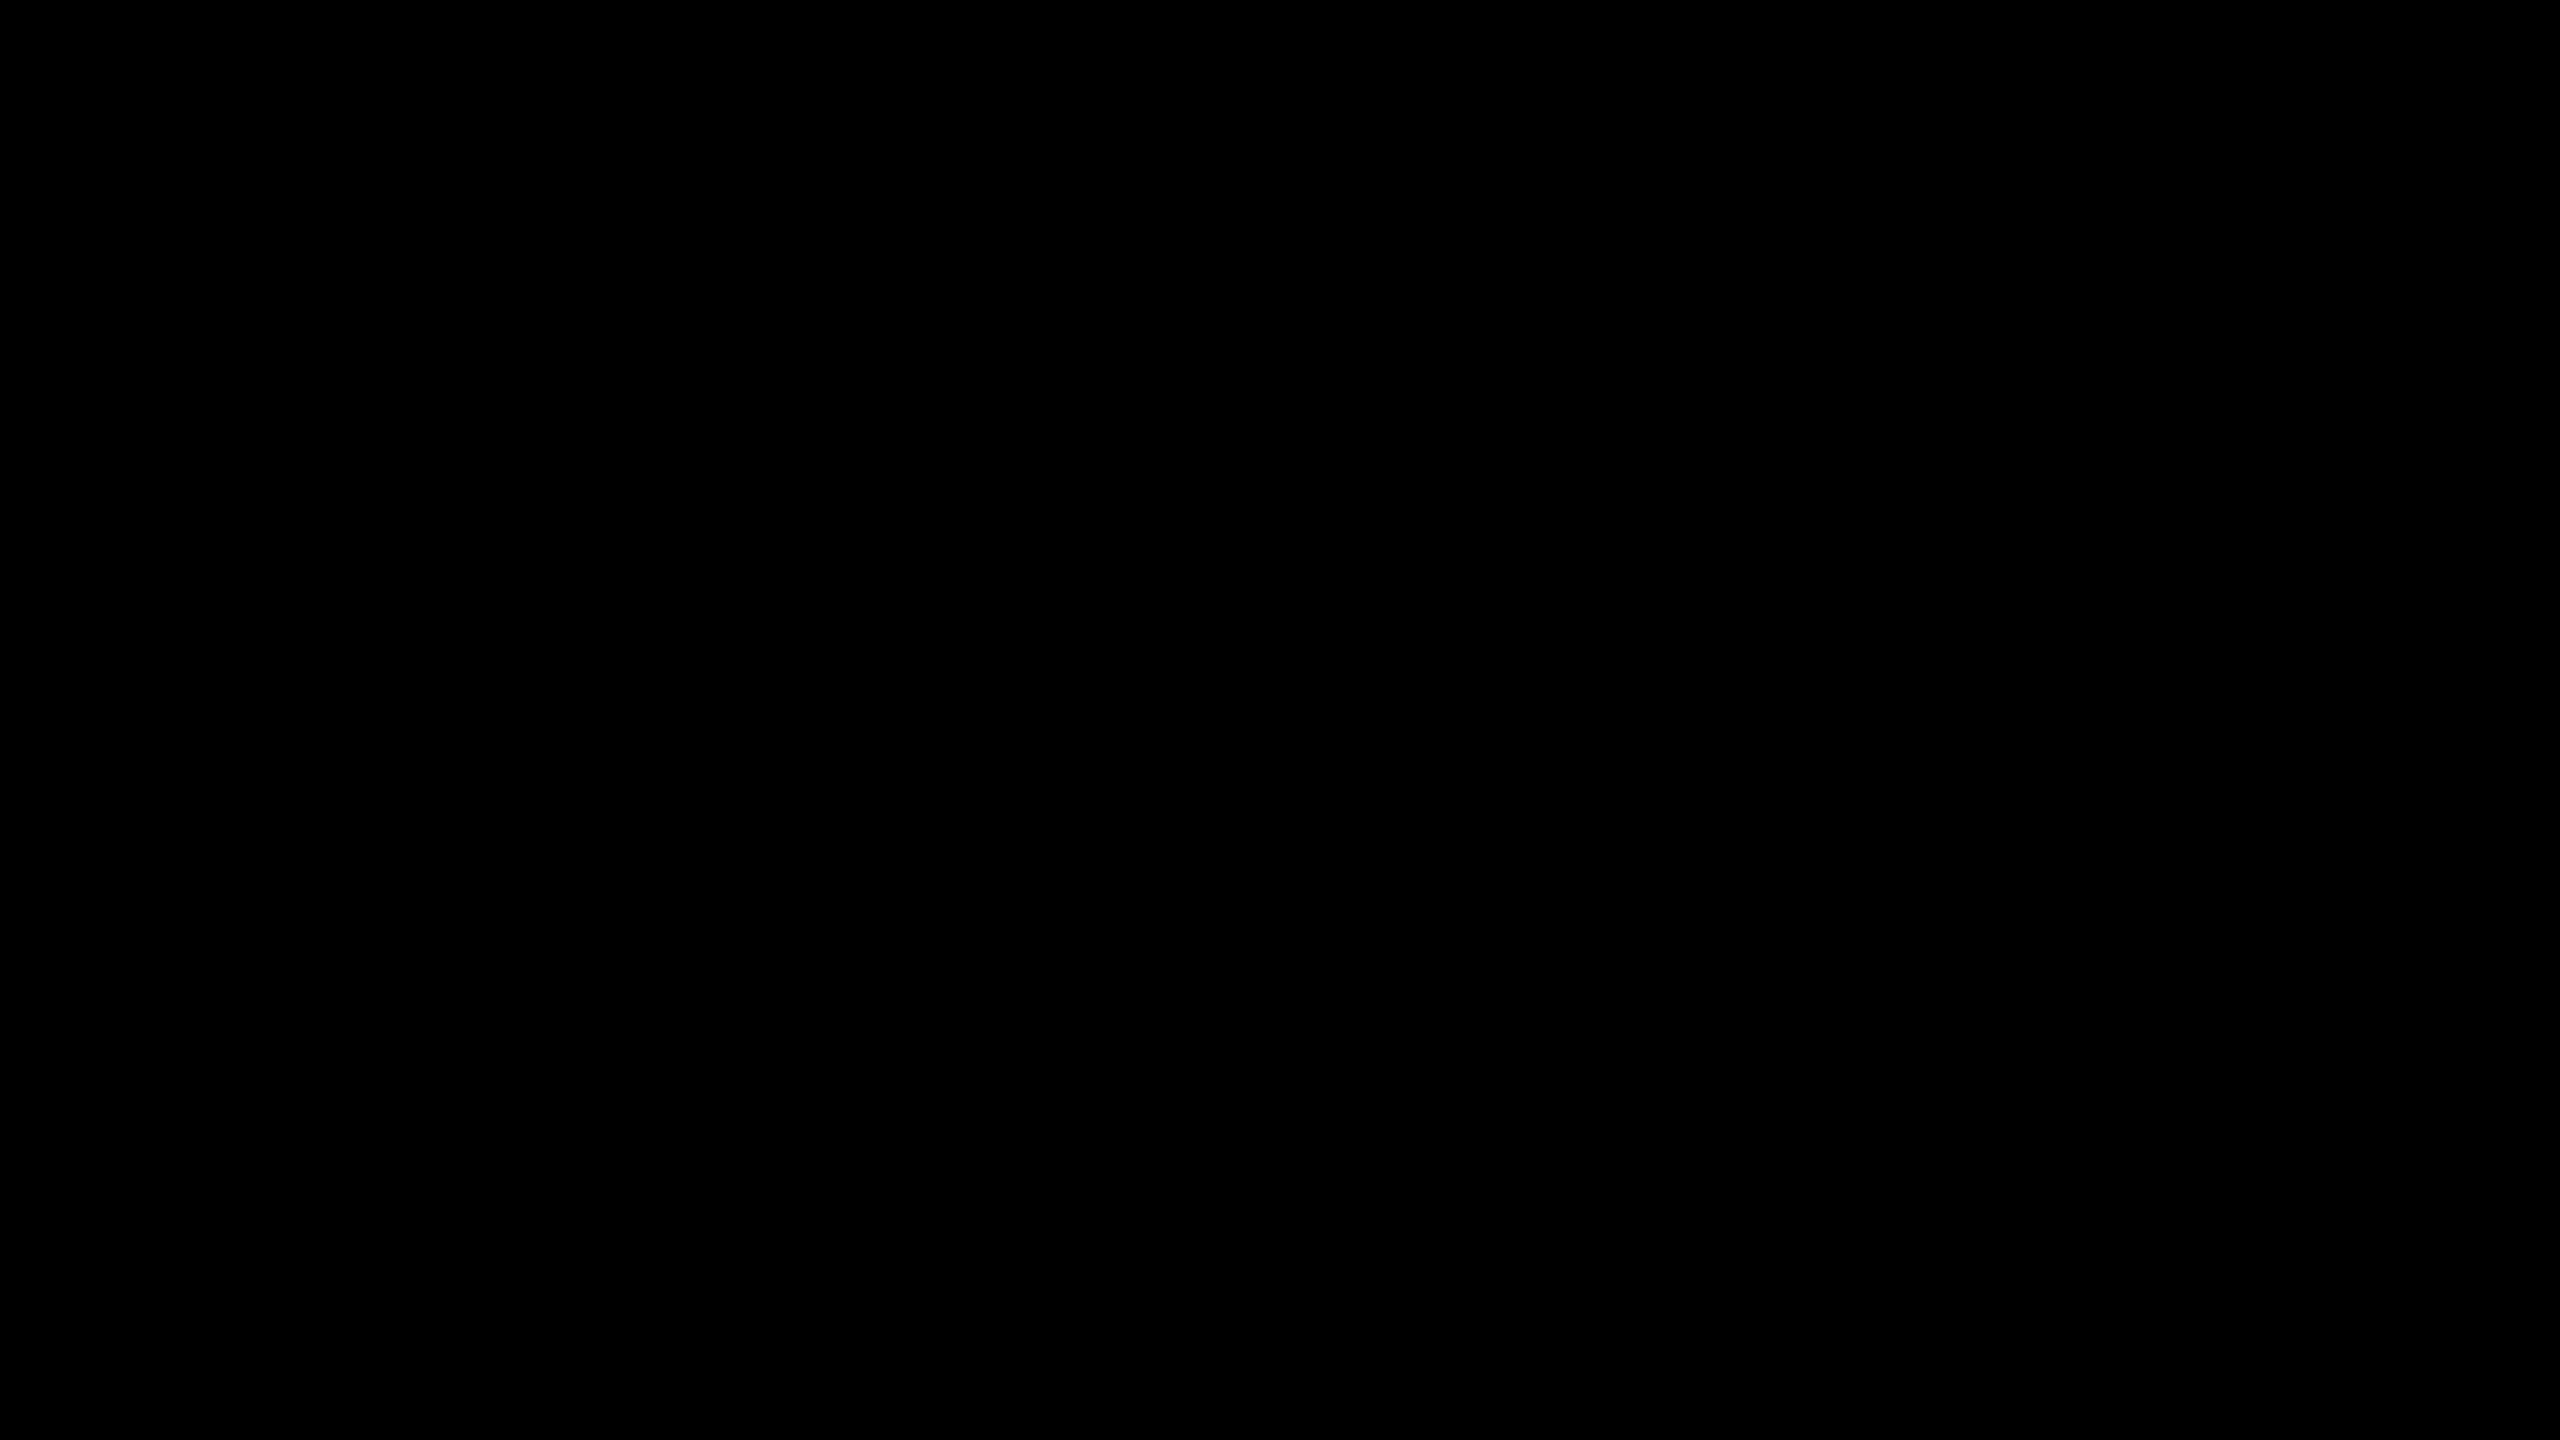 𝗨 𝗡 𝗩 𝗜 𝗘 𝗪 𝗦 (@unviews) Cover Image